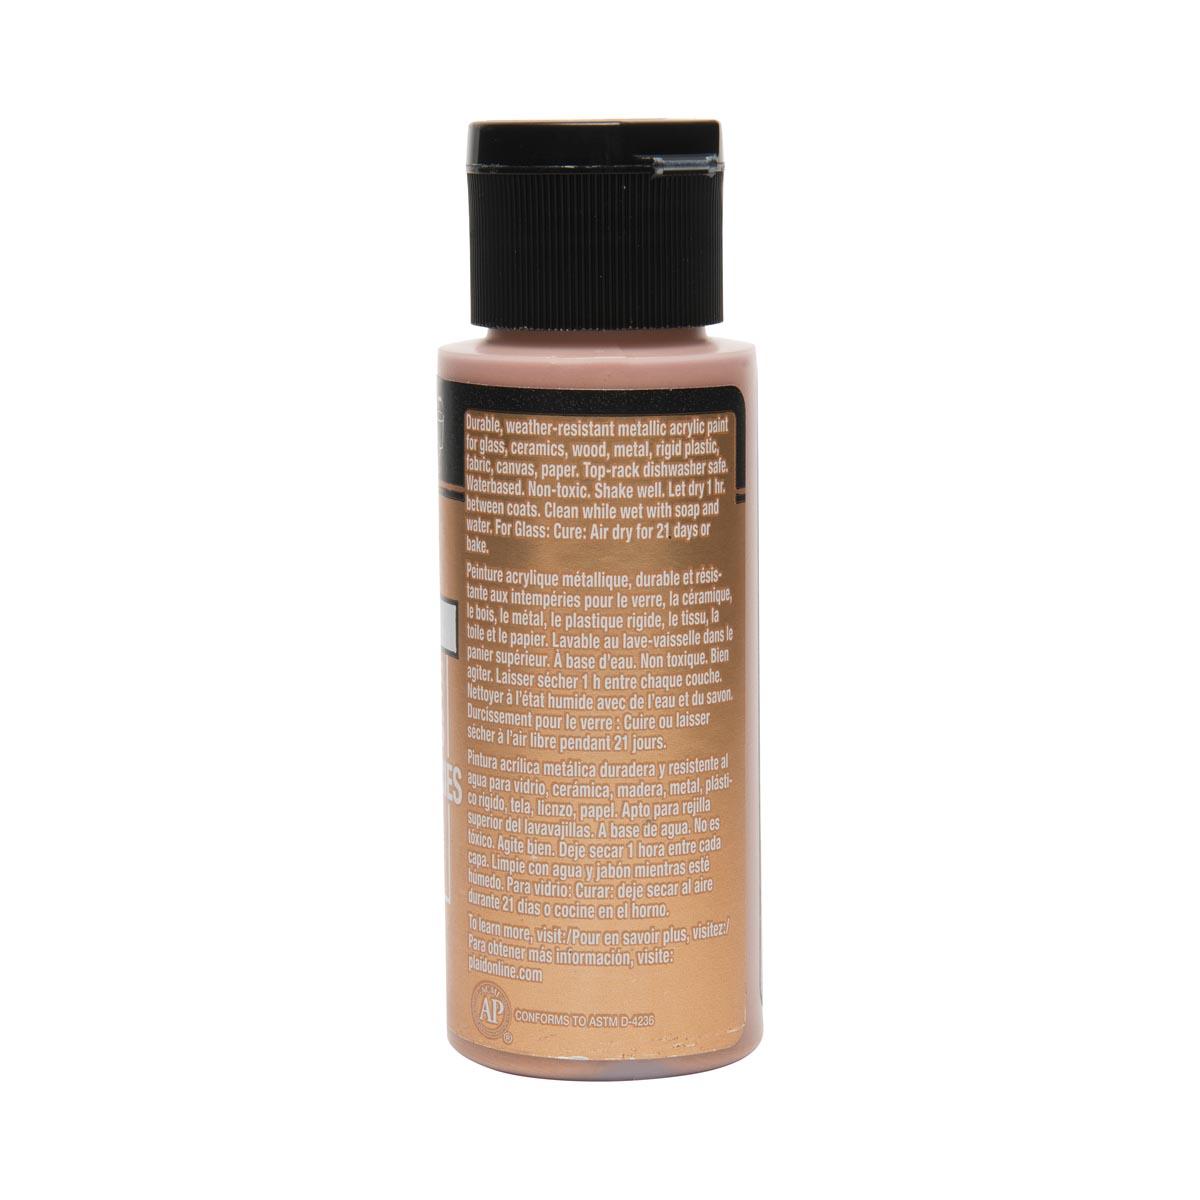 FolkArt ® Multi-Surface Metallic Acrylic Paints - Bronze, 2 oz. - 6303